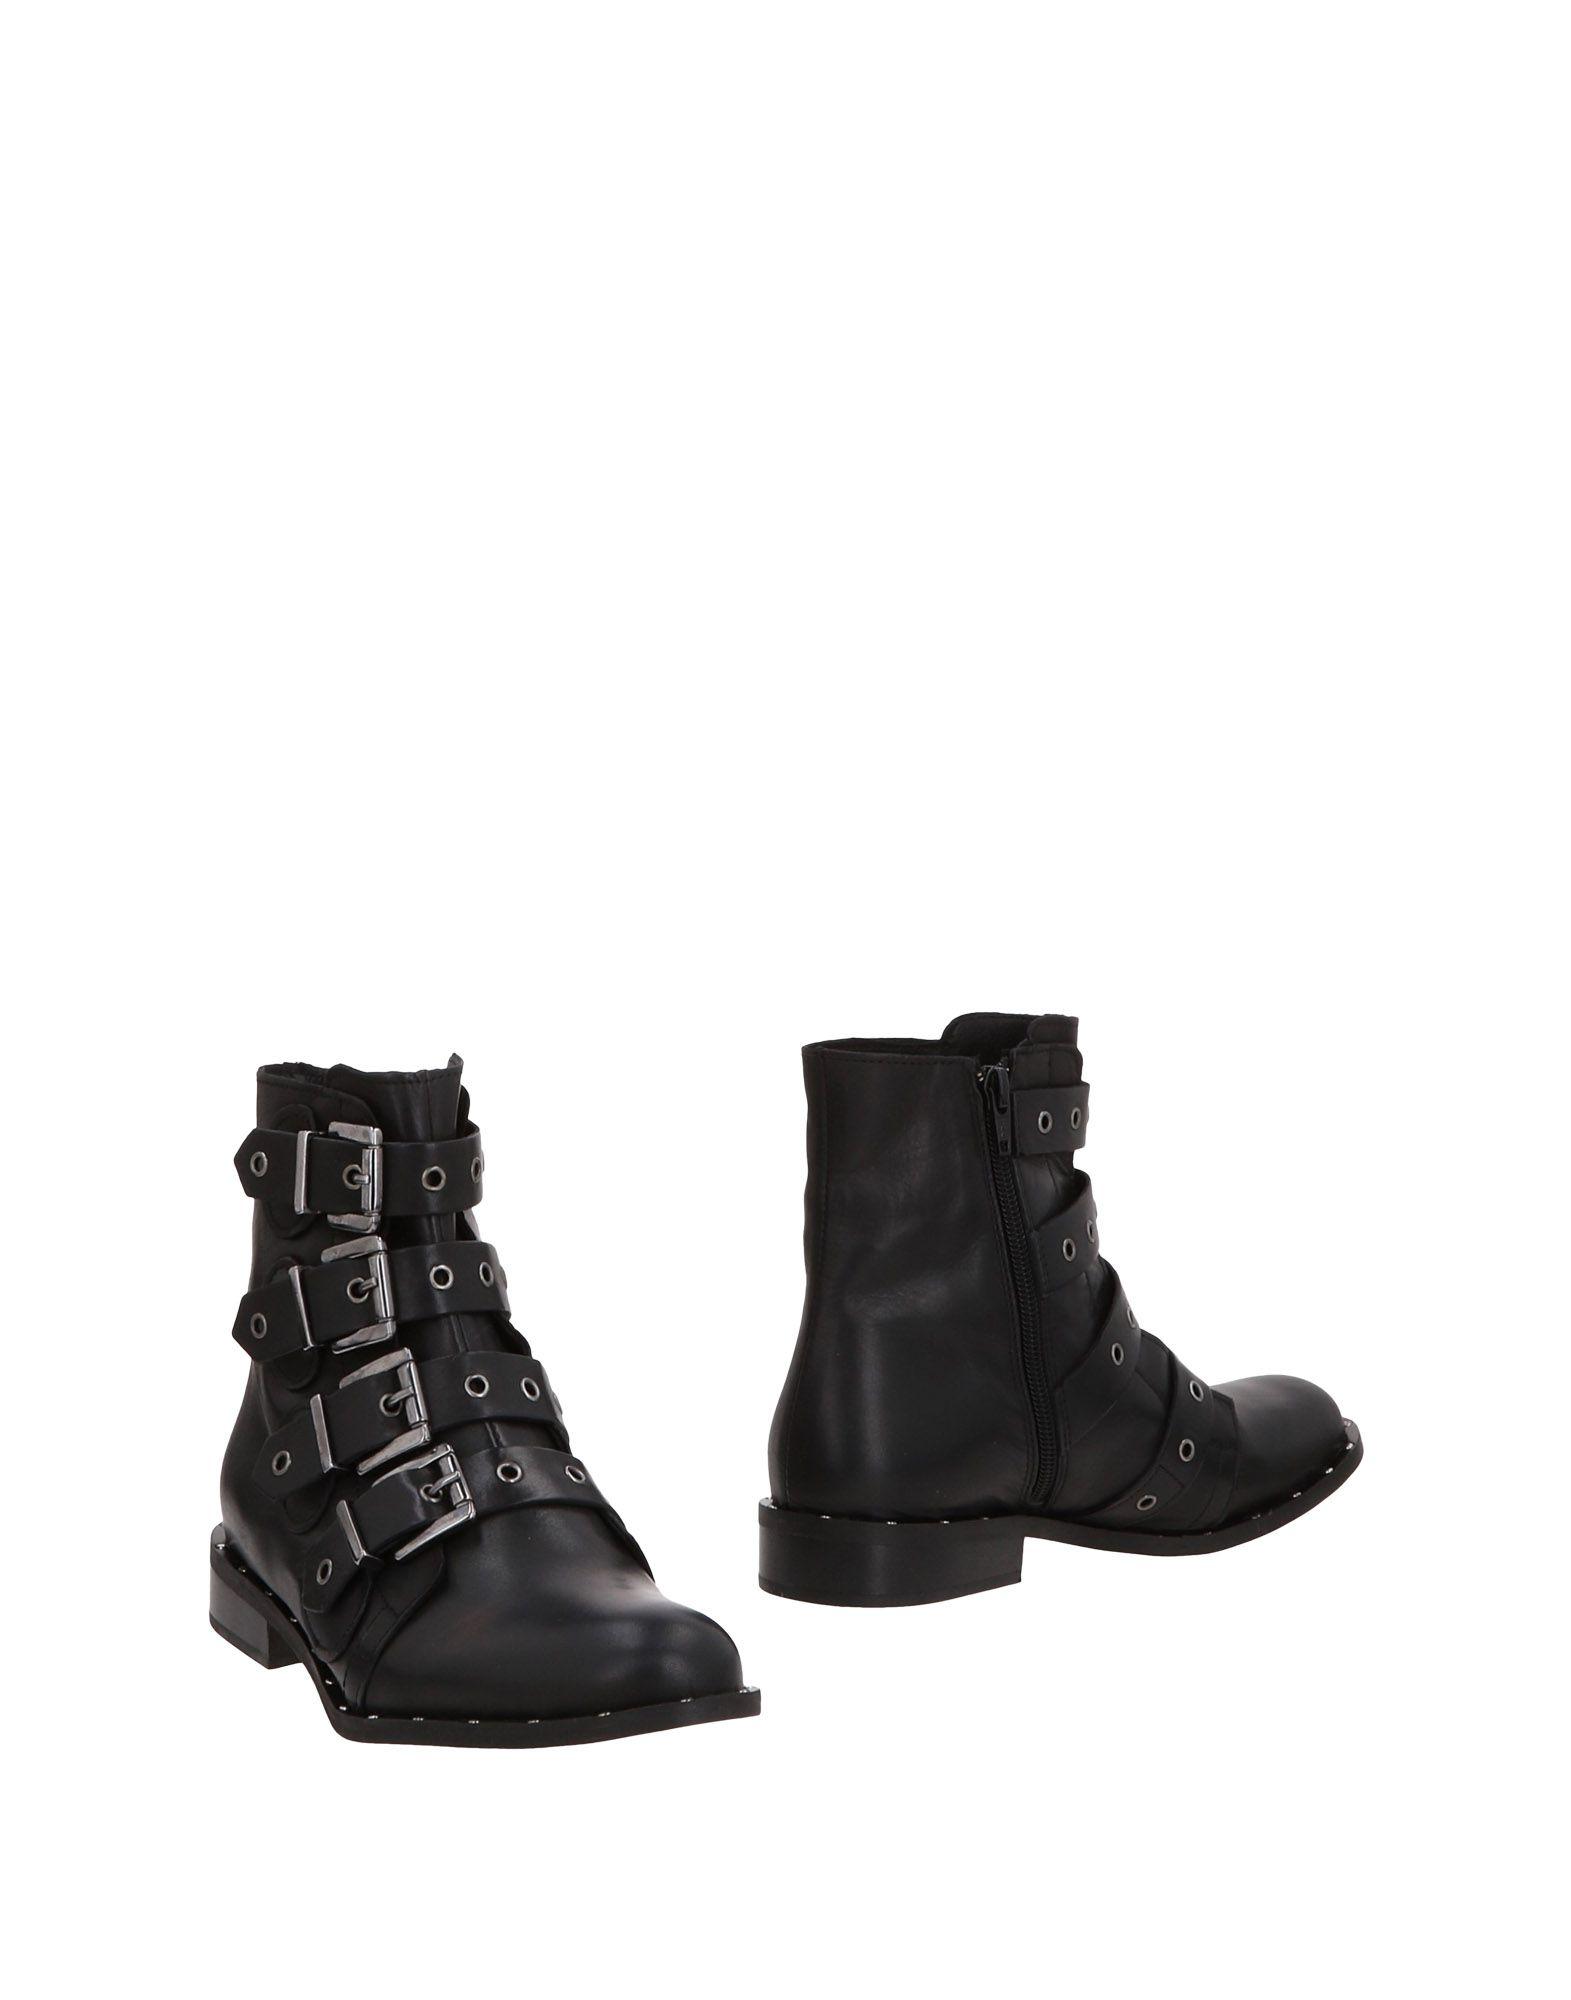 Unlace Stiefelette Damen  11474512KU Gute Qualität beliebte Schuhe